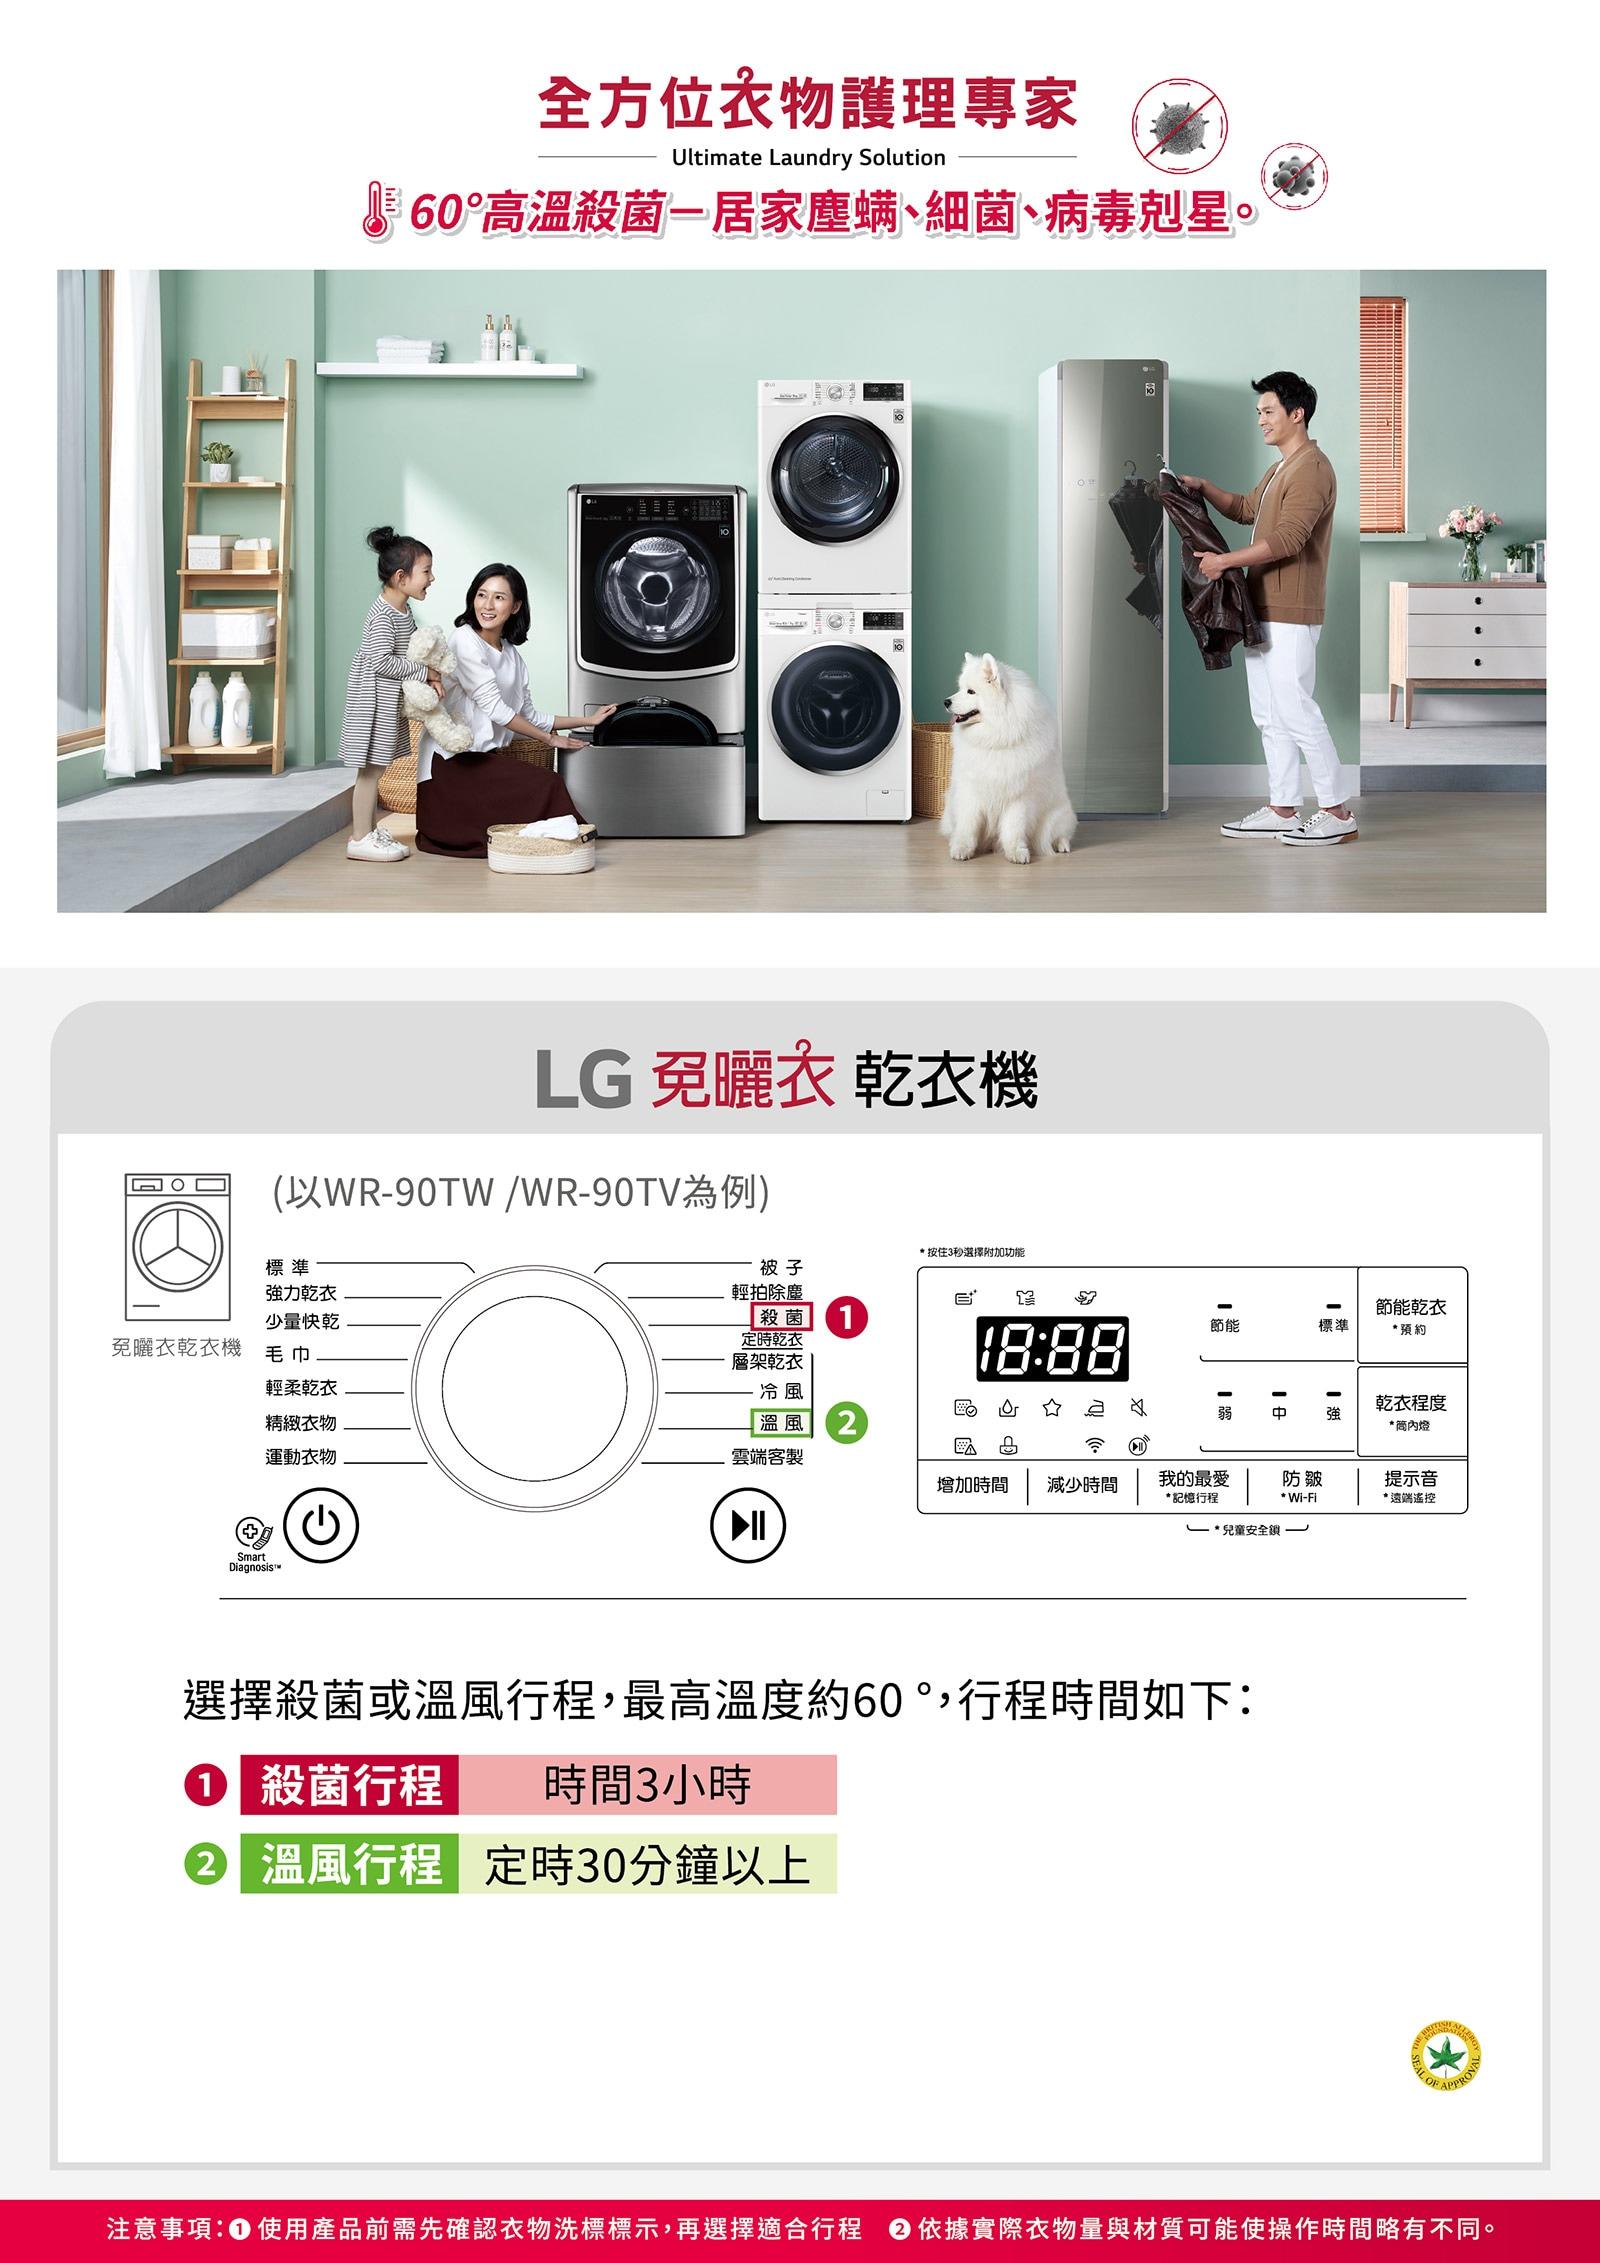 LG_MSY_Dryer_D